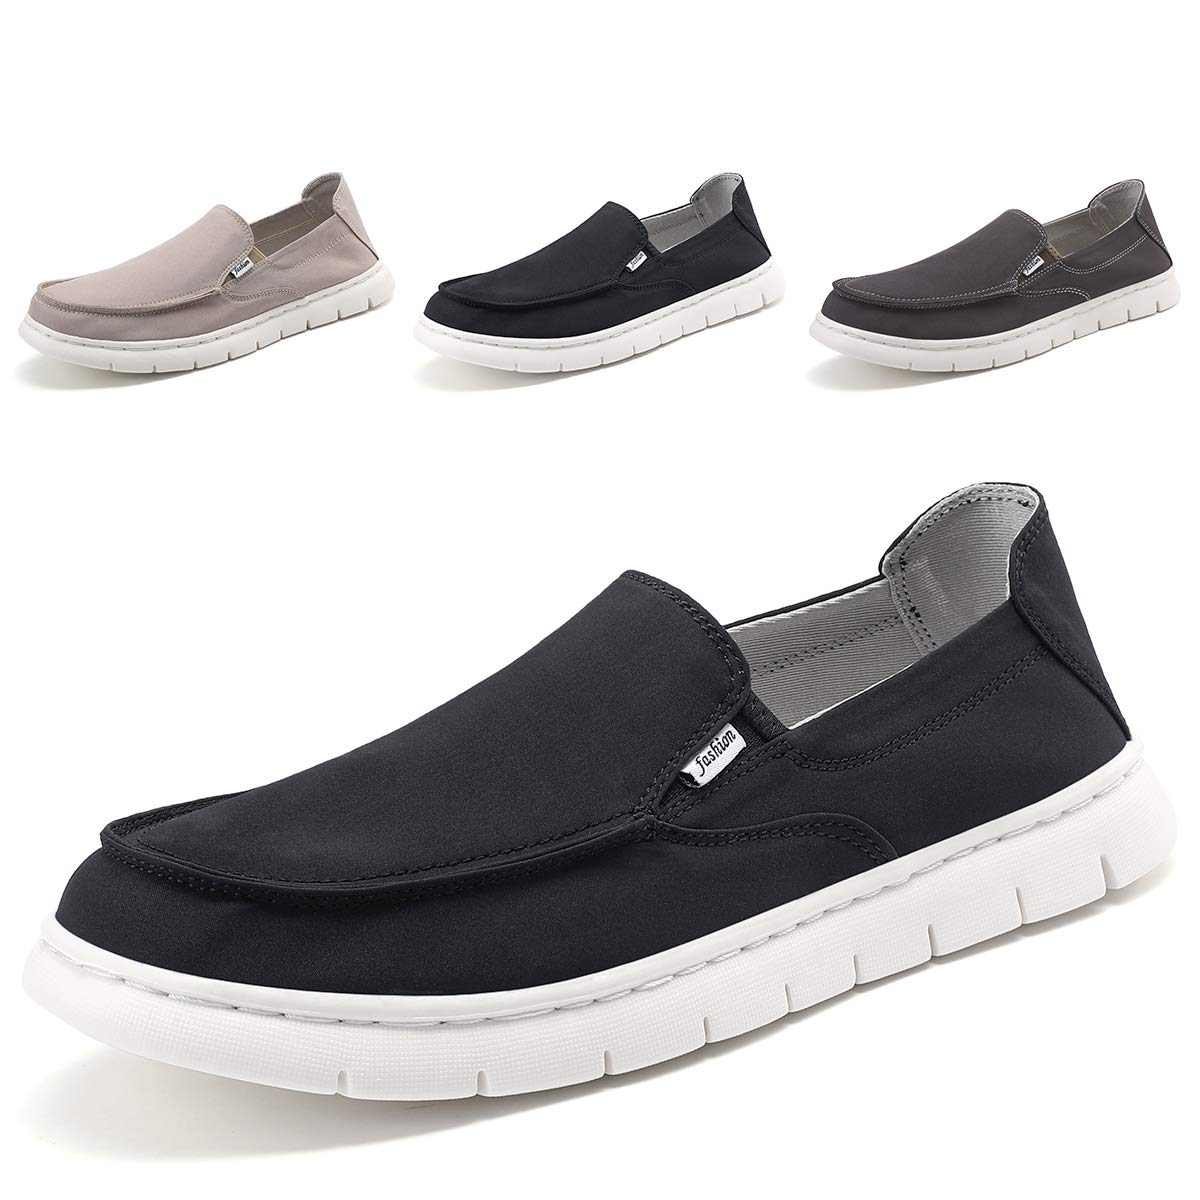 SONLLEIVOO Mens Deck Shoes Slip on